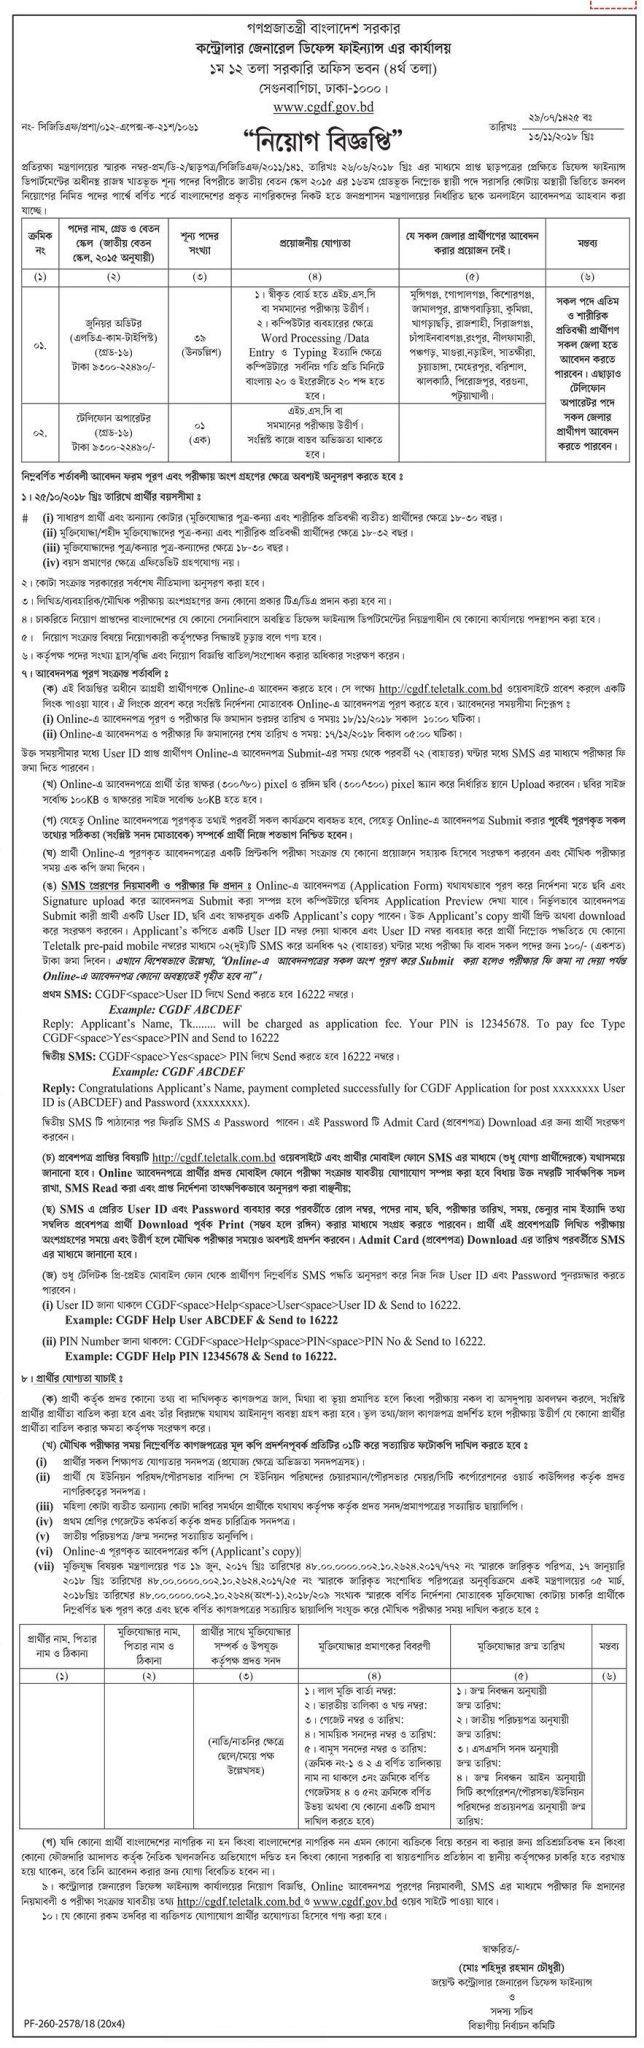 Office of the Controller General of Accounts-CGA Job Circular 2018